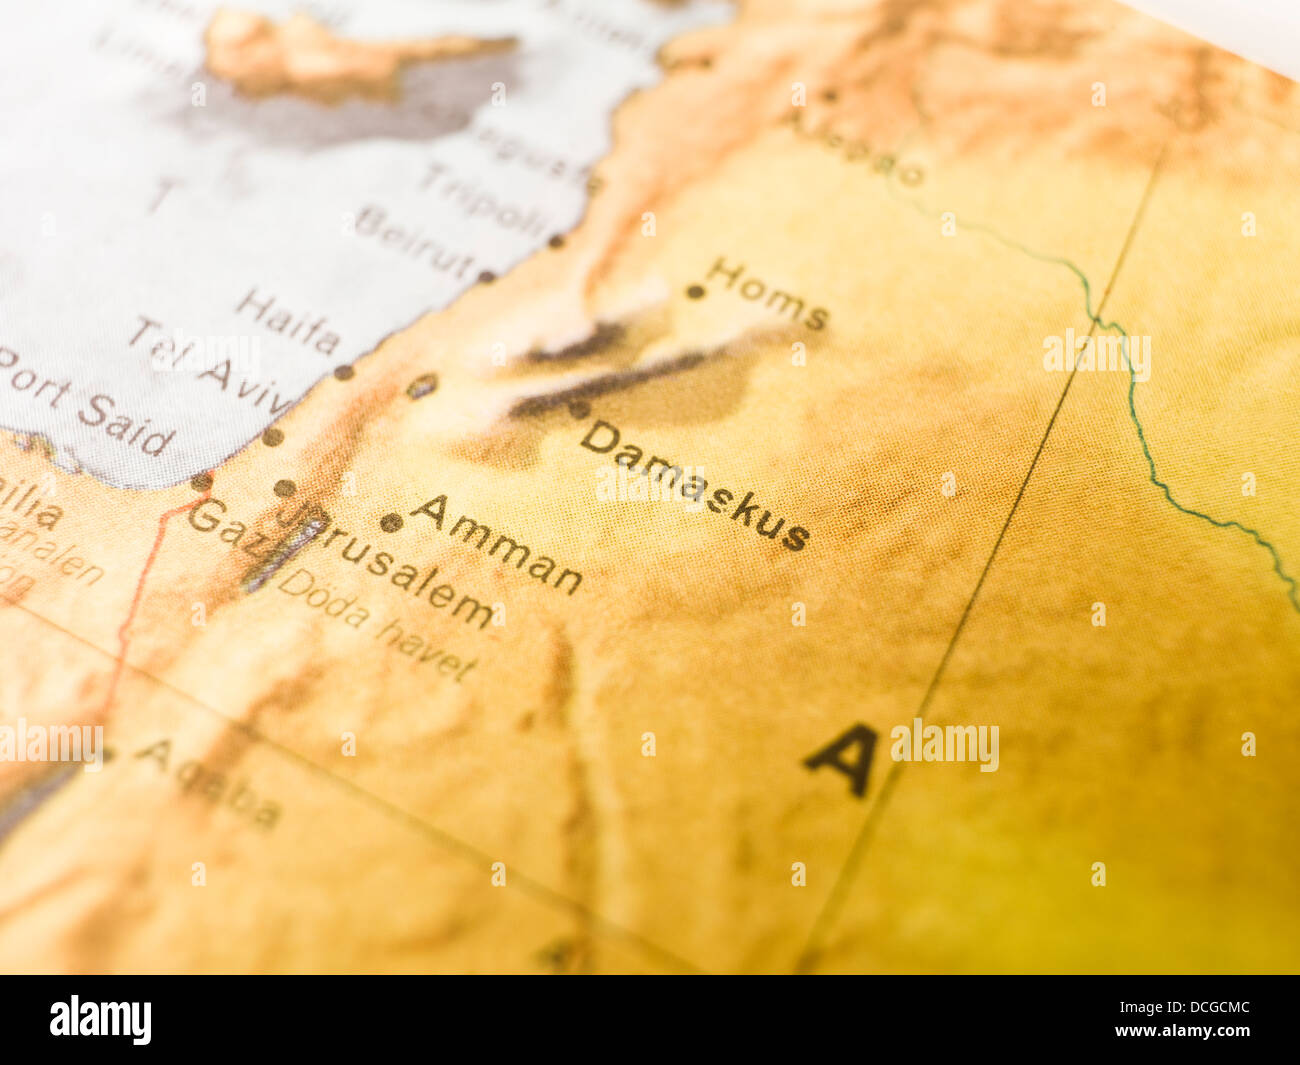 Map of Damaskus - Stock Image